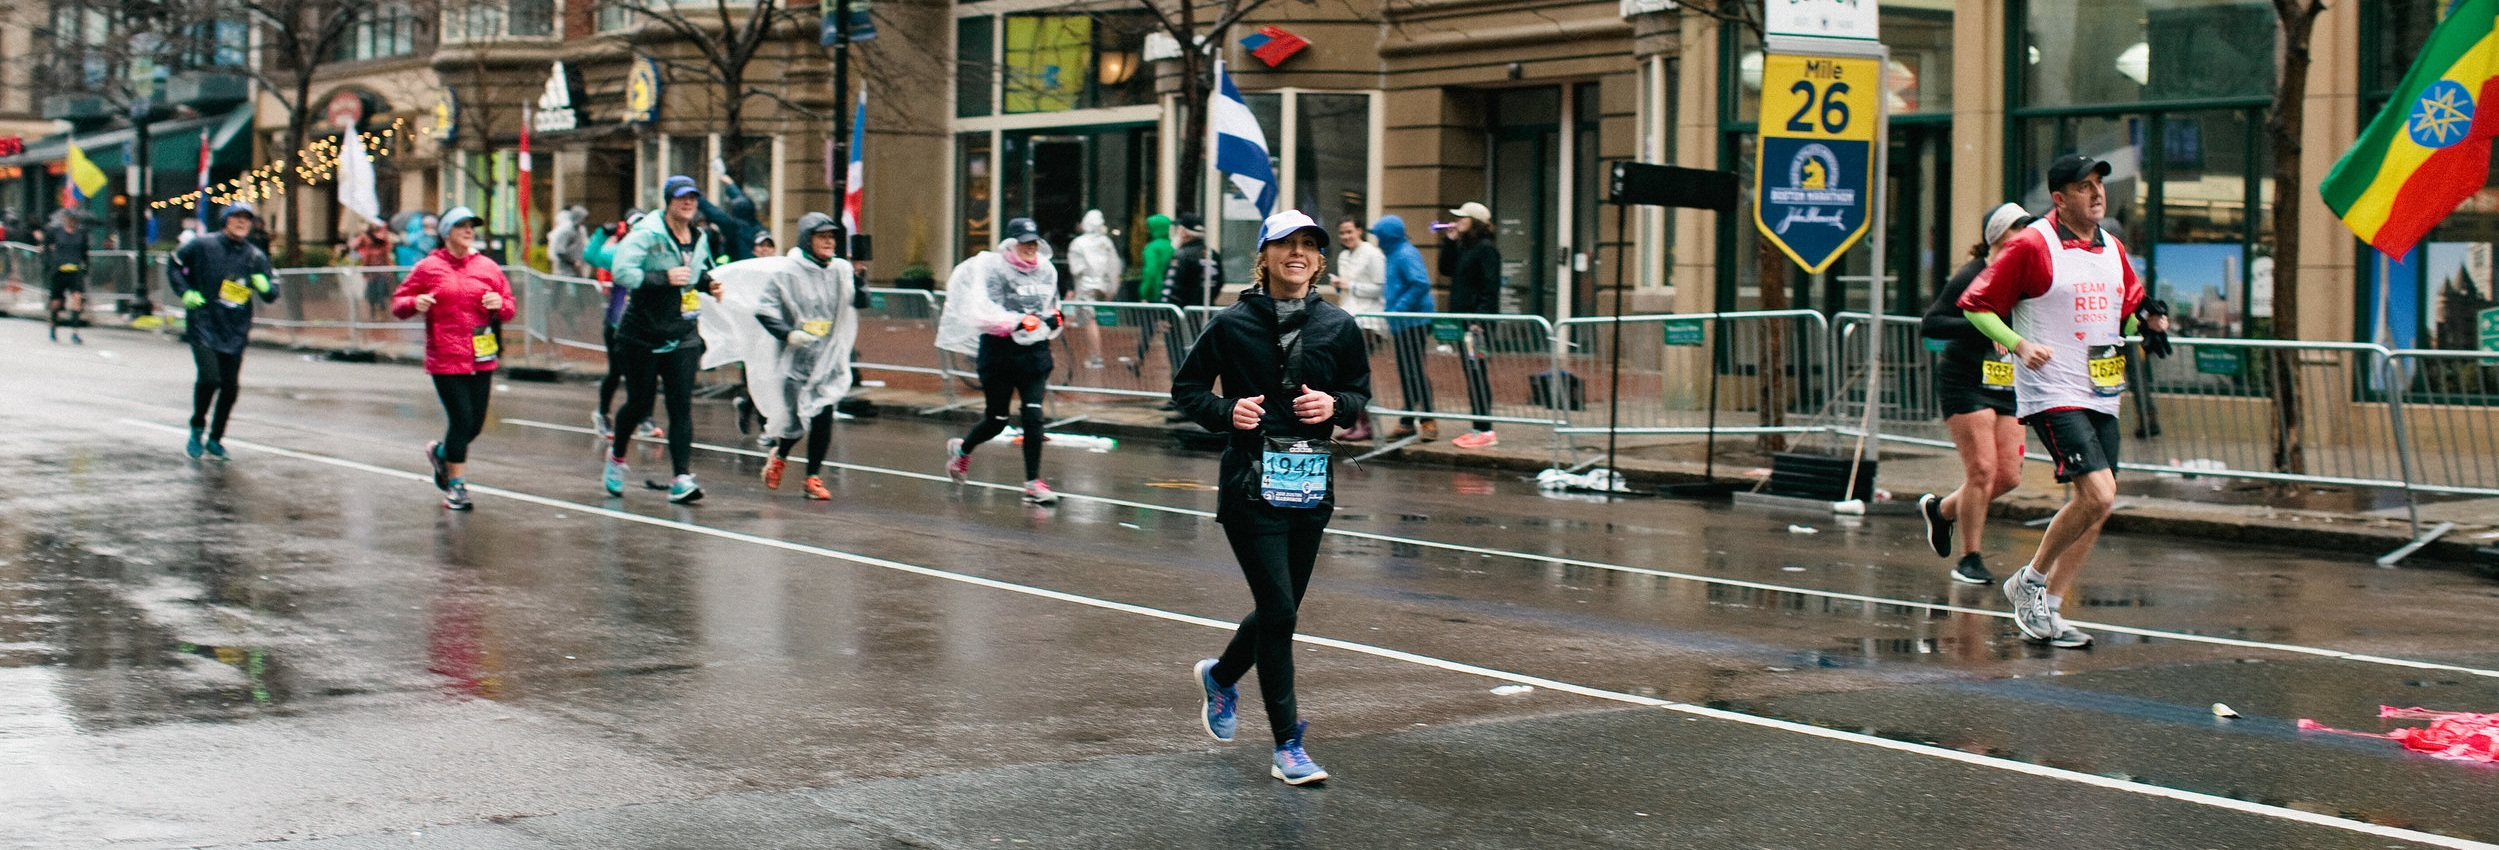 Mile 26 of the 2018 Boston Marathon. Photo by Tina Florance